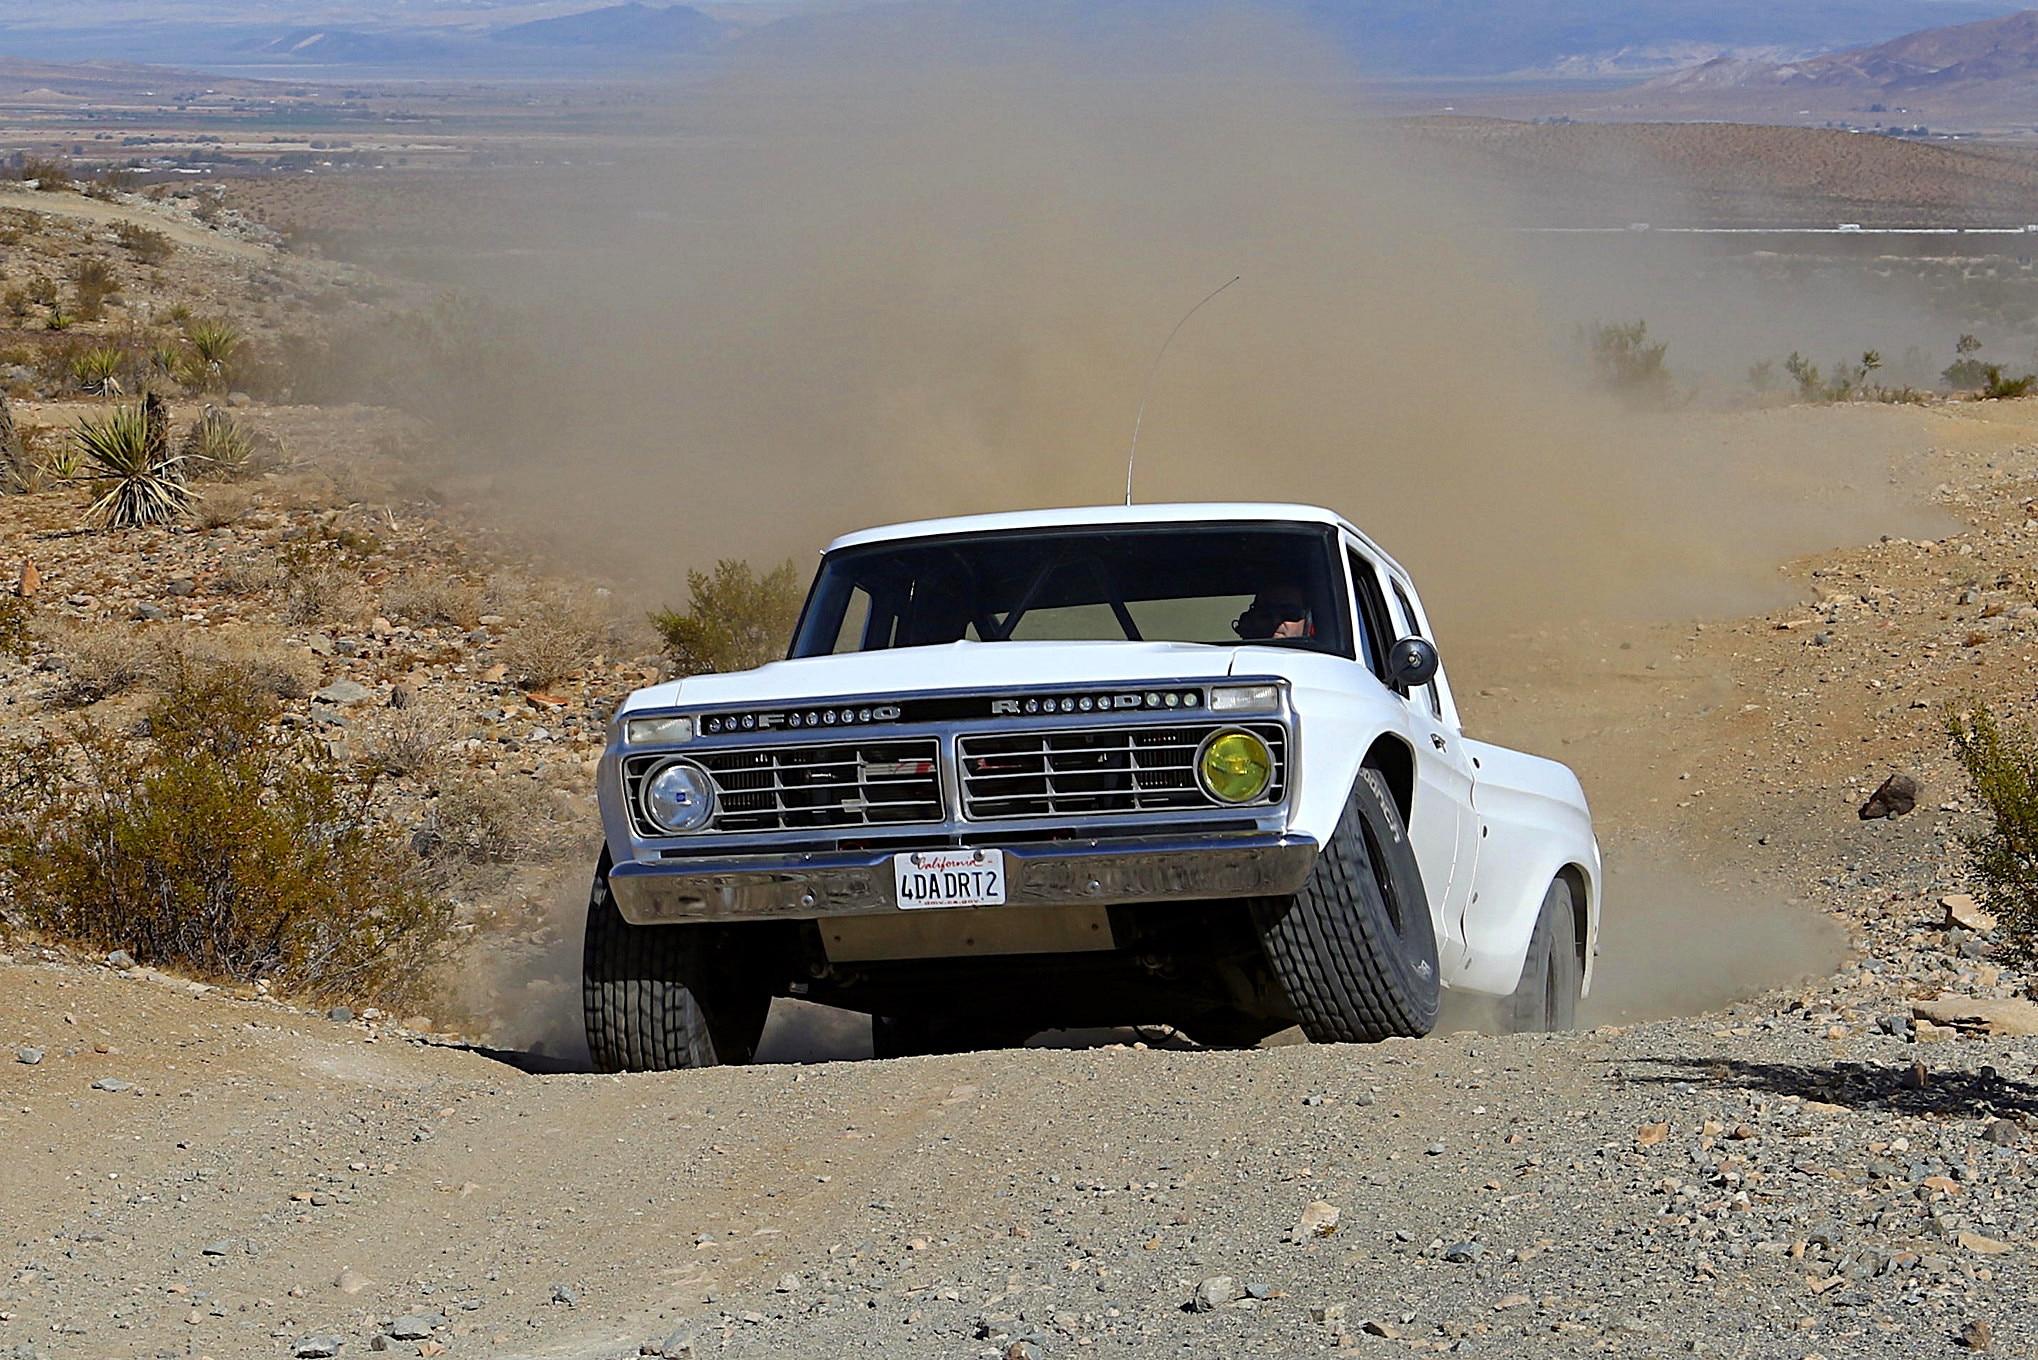 017 ford f100 bfgoodrich blitzkrieg fox eibach kmc dirt tech desertworks mcqueen trailer products front low up.JPG